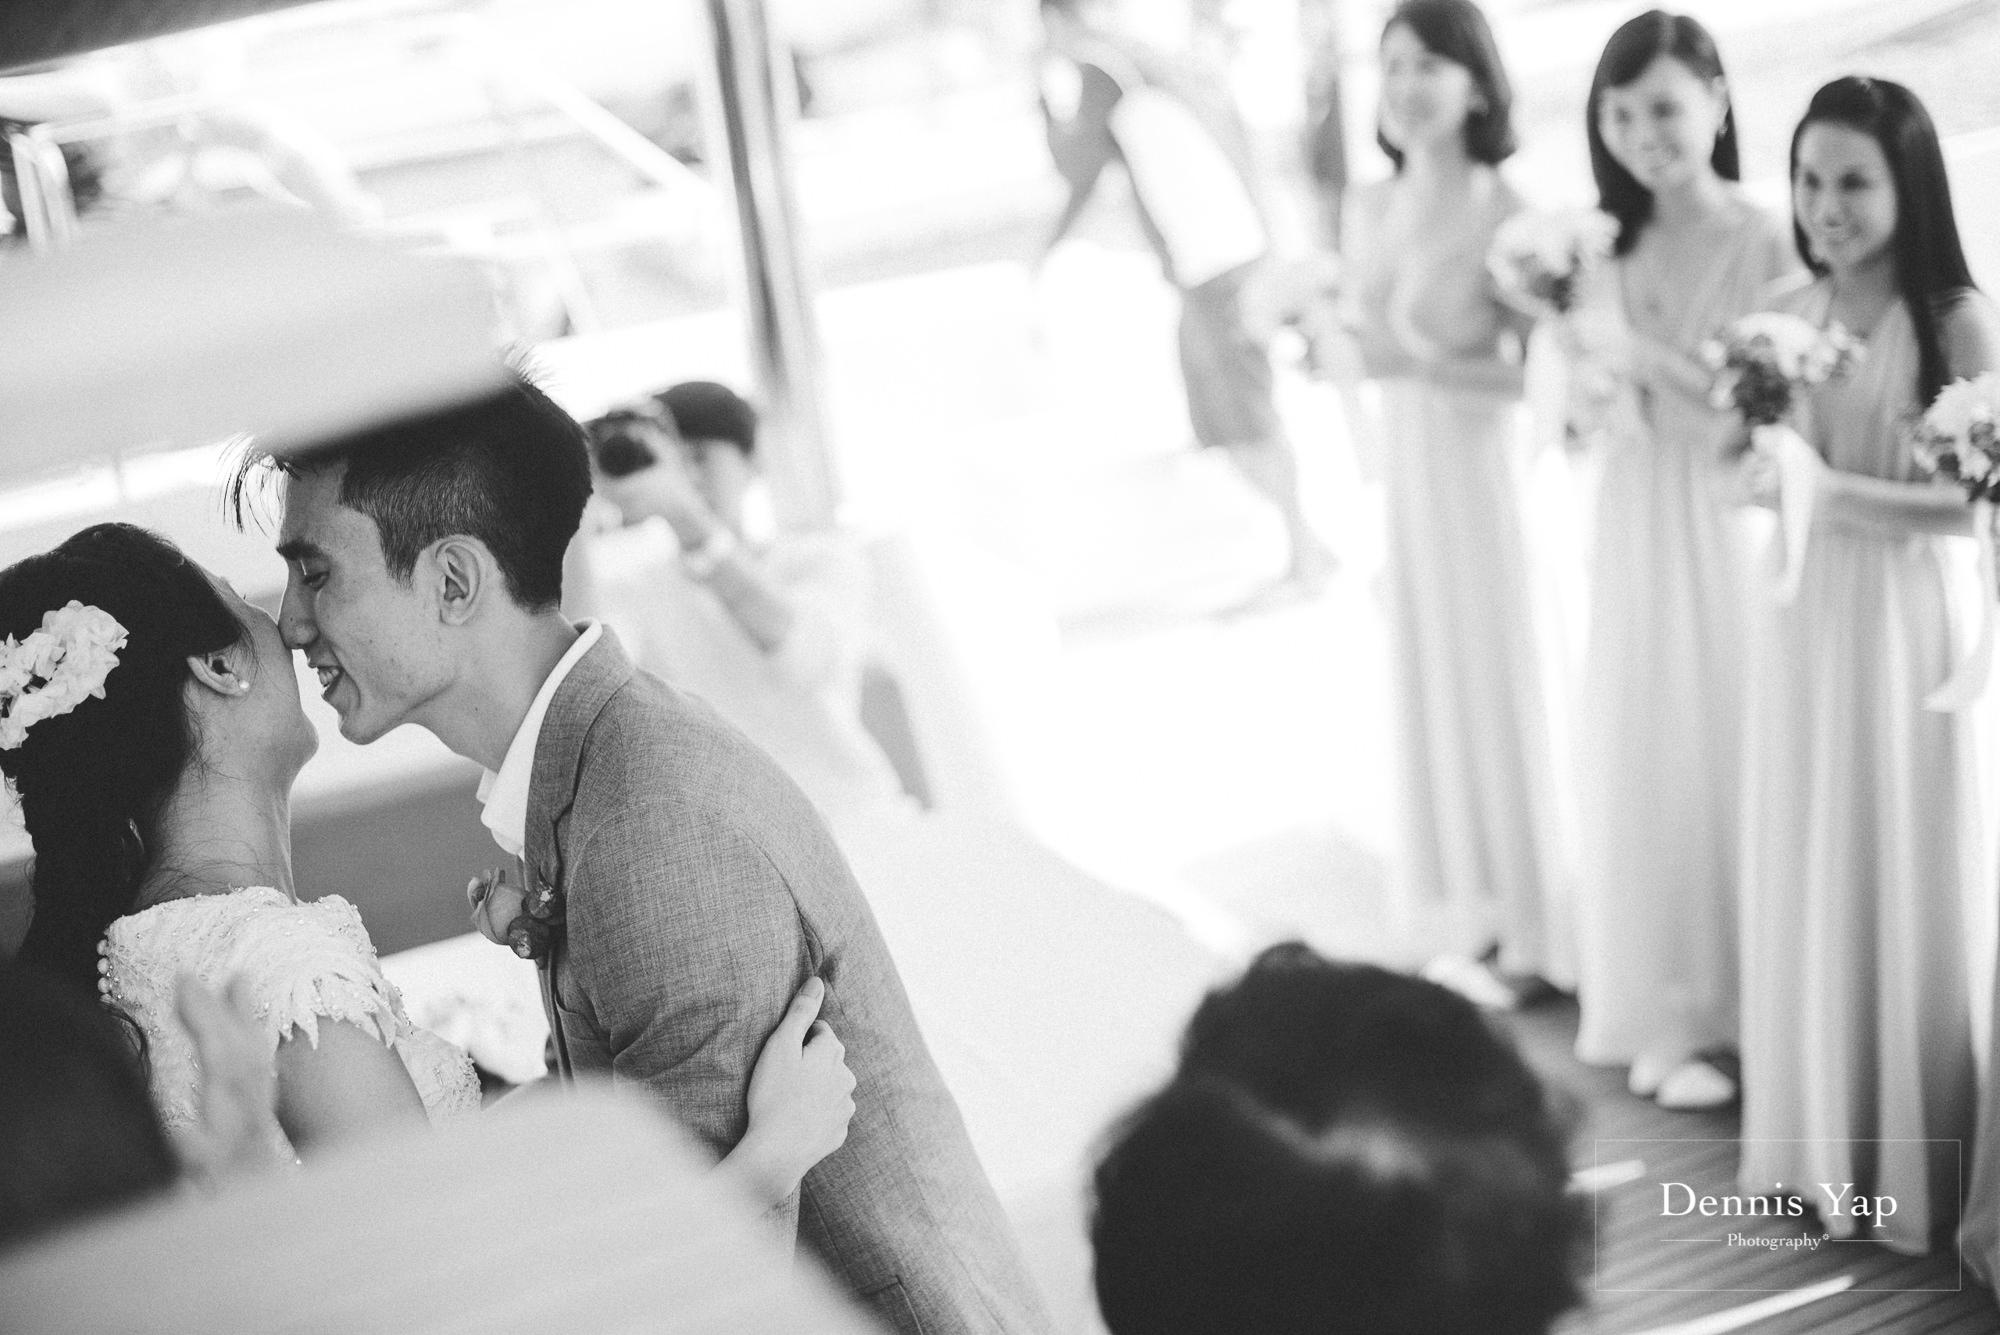 danny sherine wedding reception registration of marriage yacht fun beloved sea dennis yap photography malaysia top wedding photographer-21.jpg